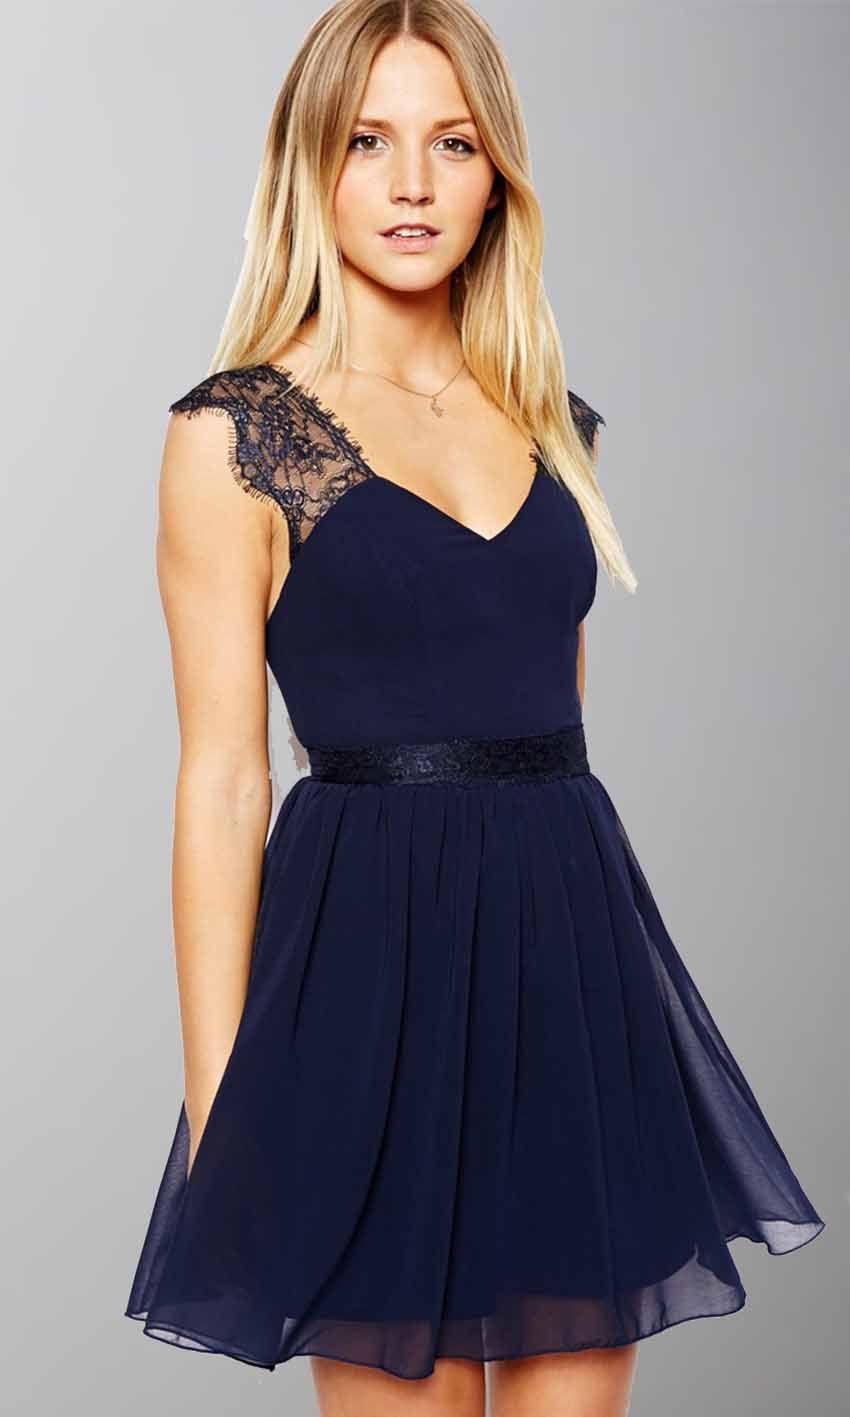 V neck lace dress uk online